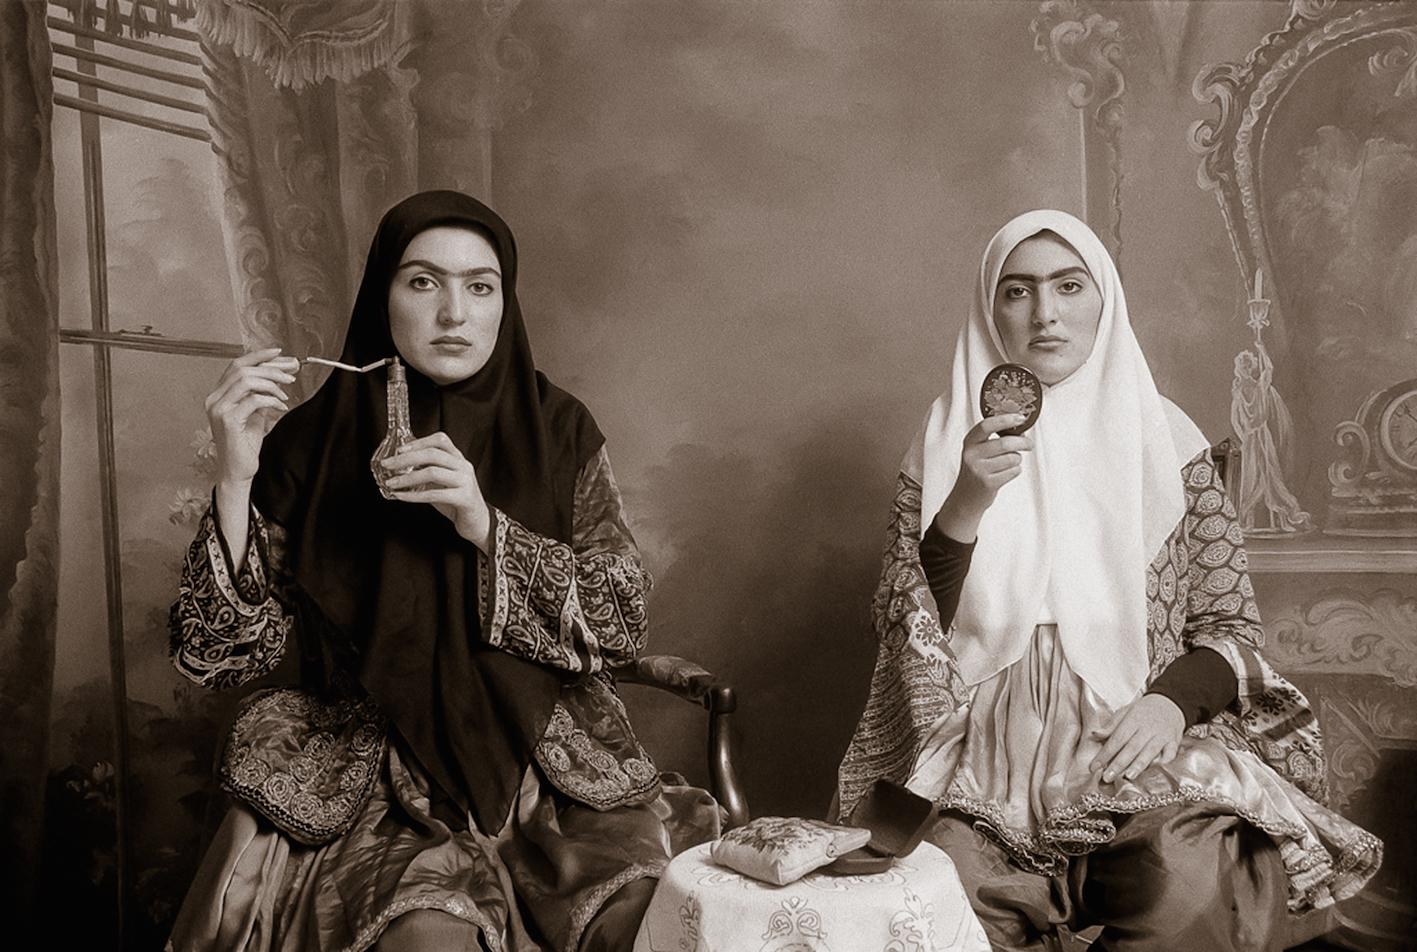 Shadi Ghadirian, Qajar #7, 1998.